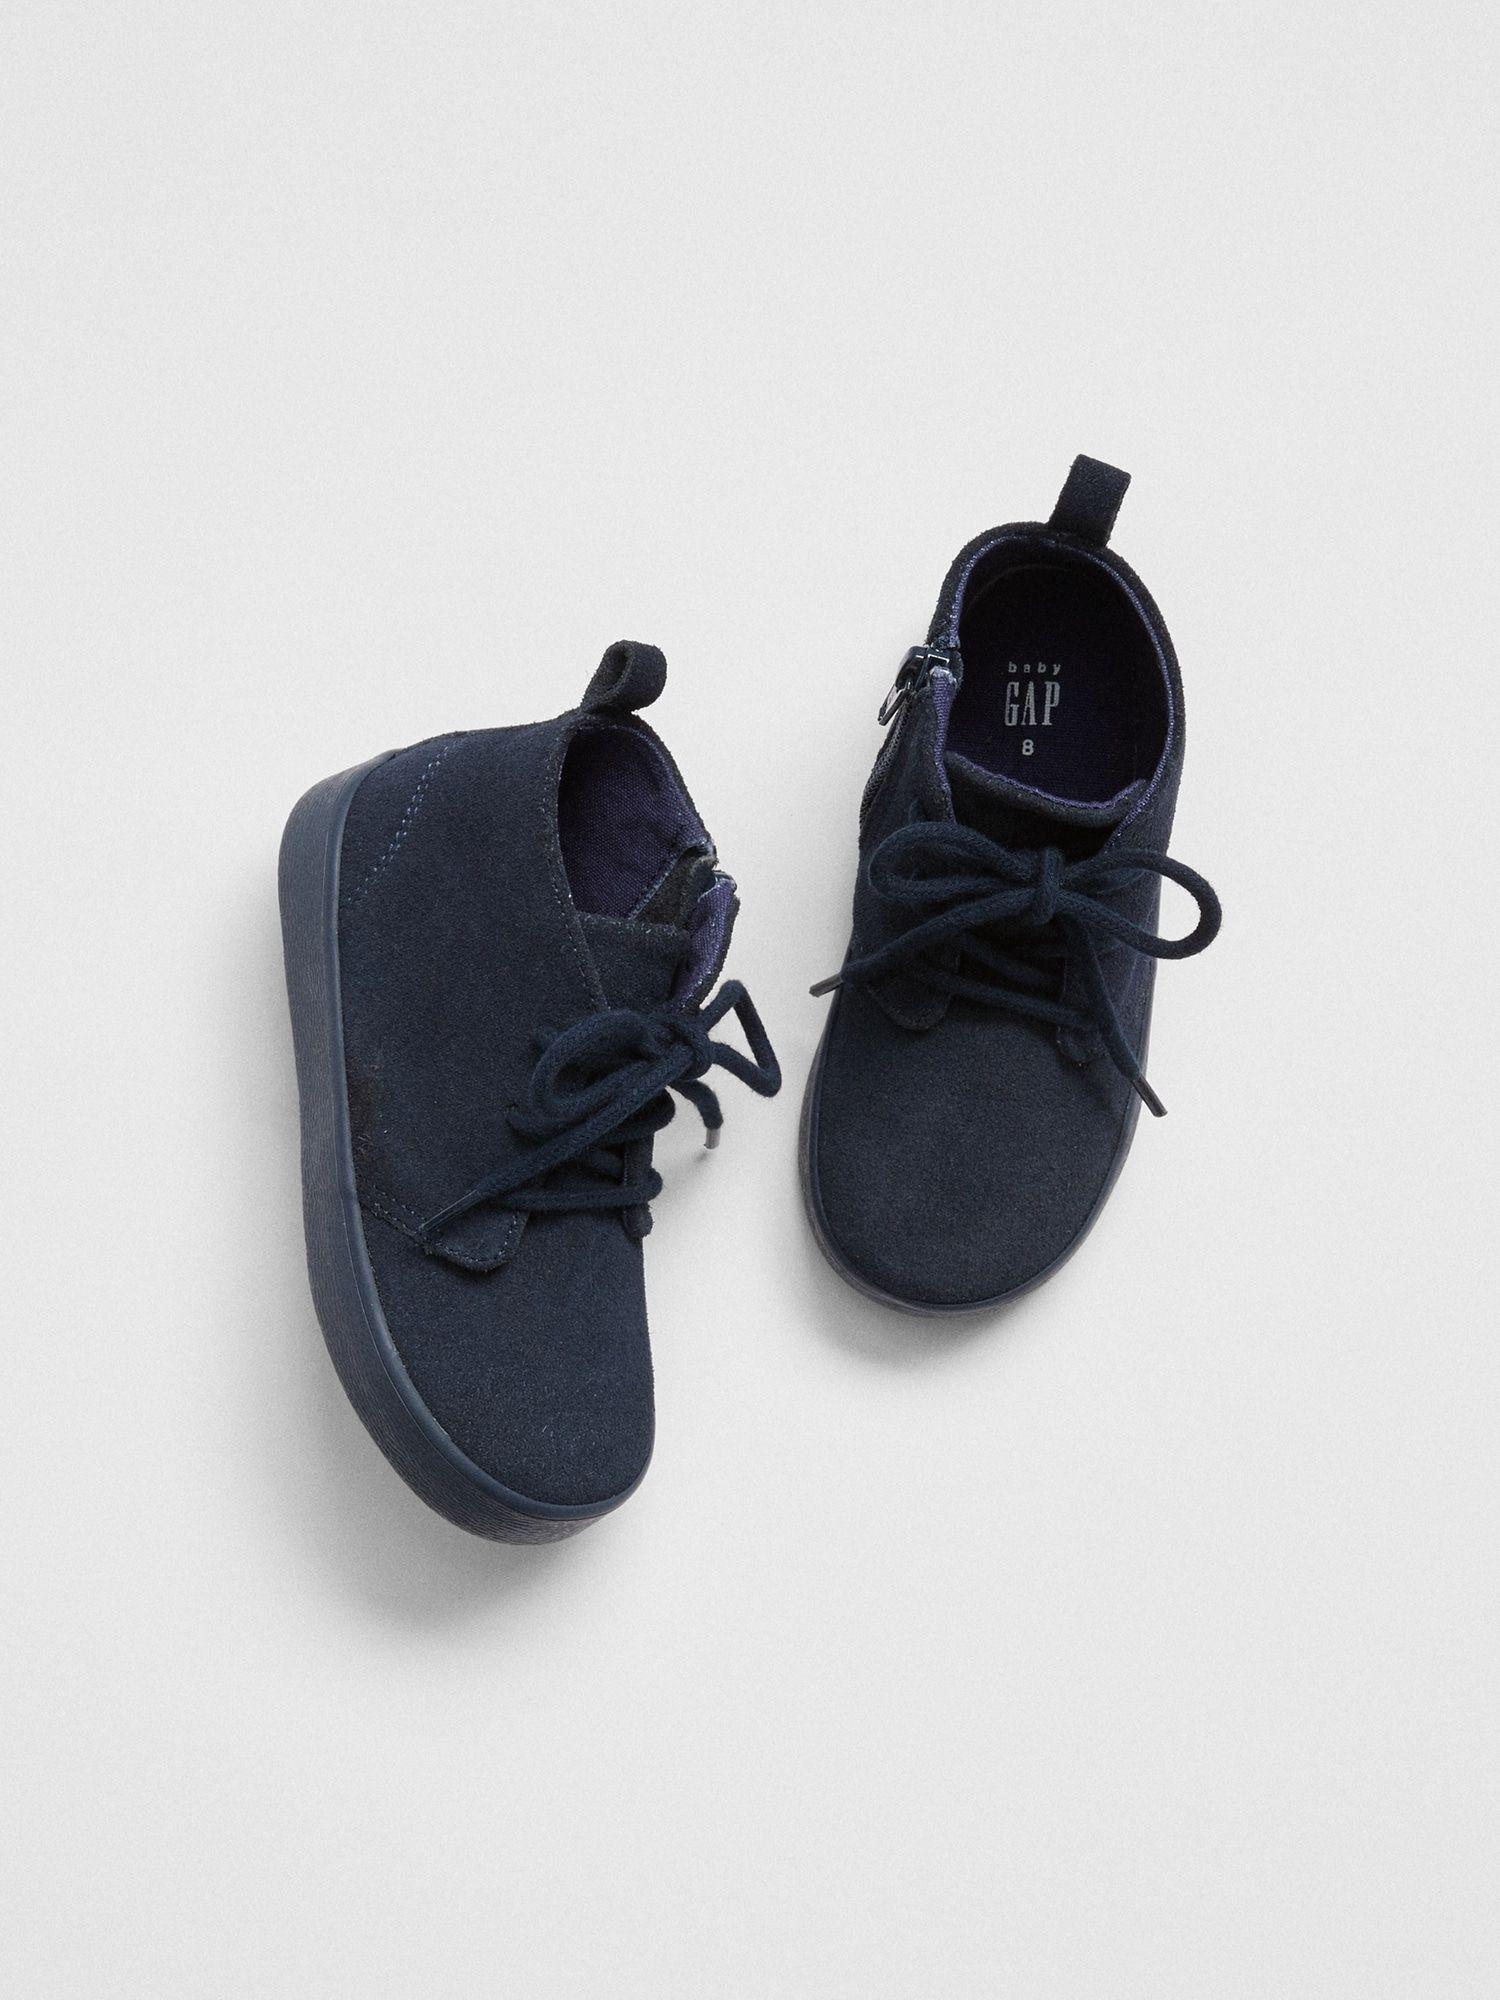 toddler shoes, Toddler boy dress shoes